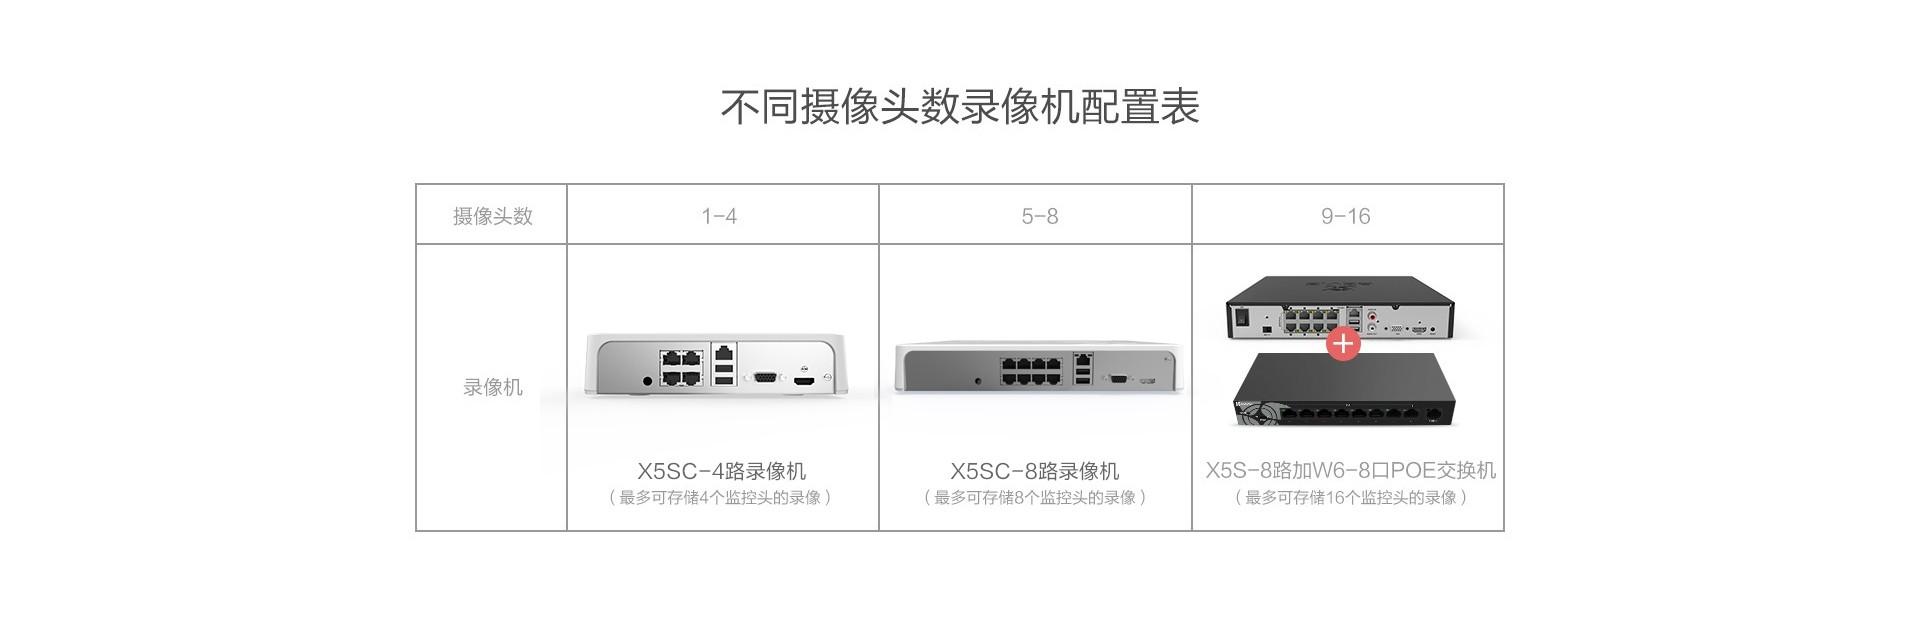 C3T+X5SC-web_03.jpg